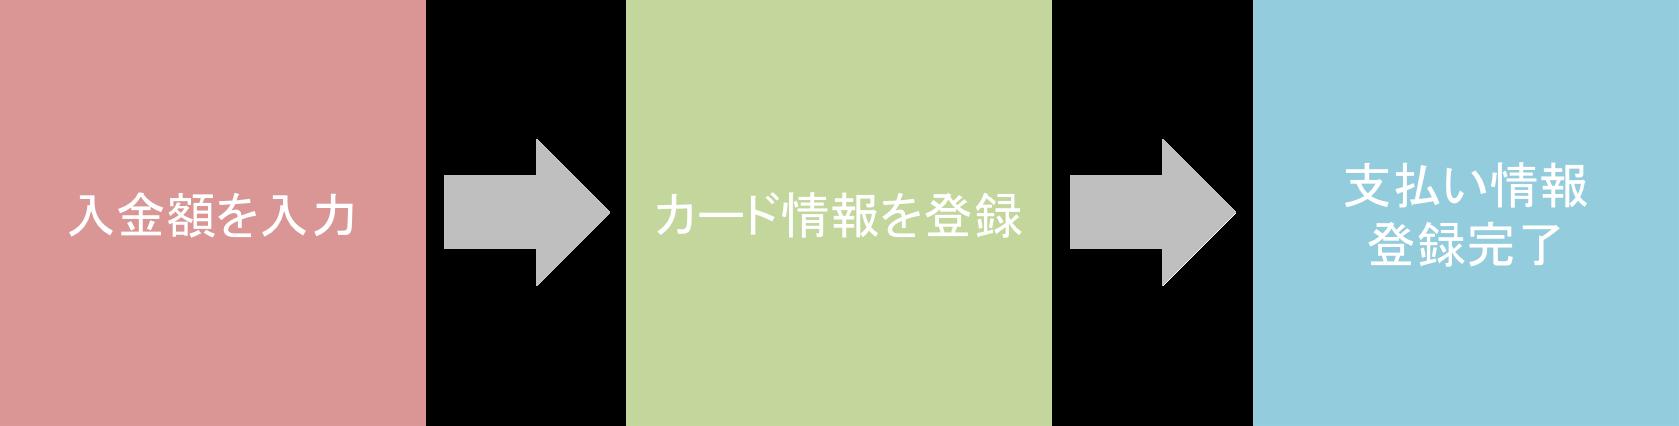 TikTokの運用型広告「TikTok Ads」の支払い情報登録の流れ